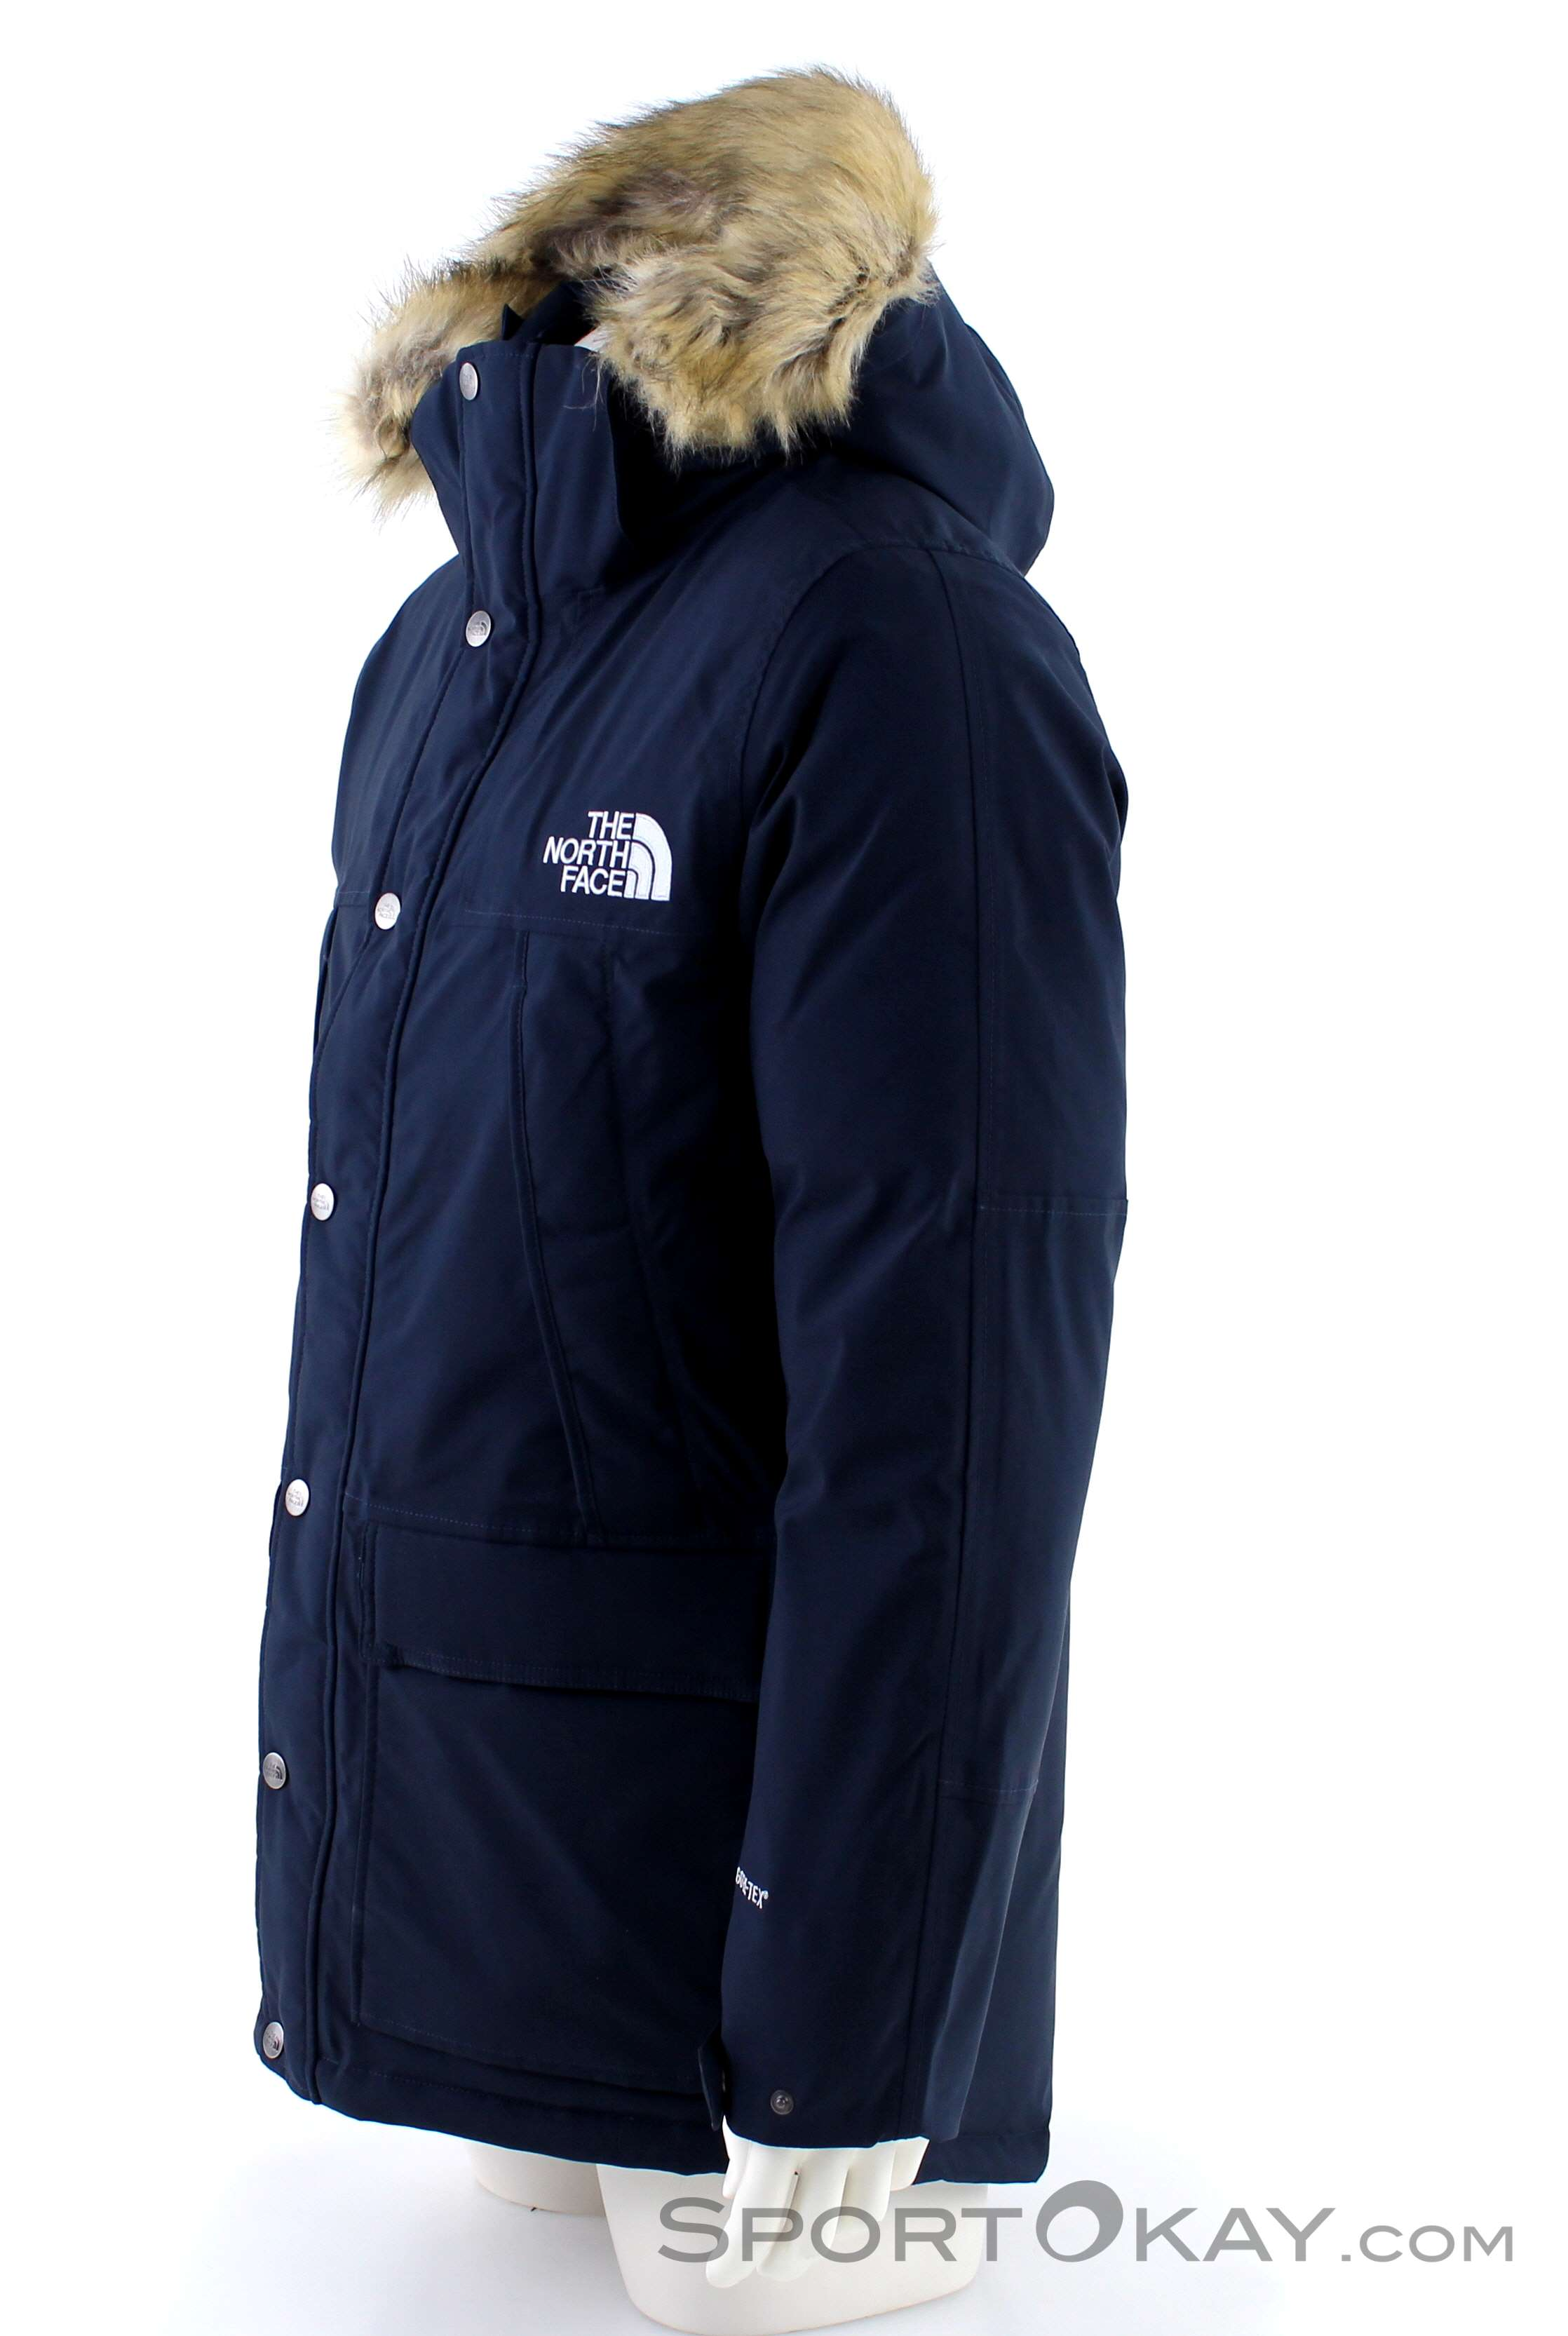 973f38c92 The North Face The North Face Mountain Murdo GTX Mens Ski Jacket Gore-Tex